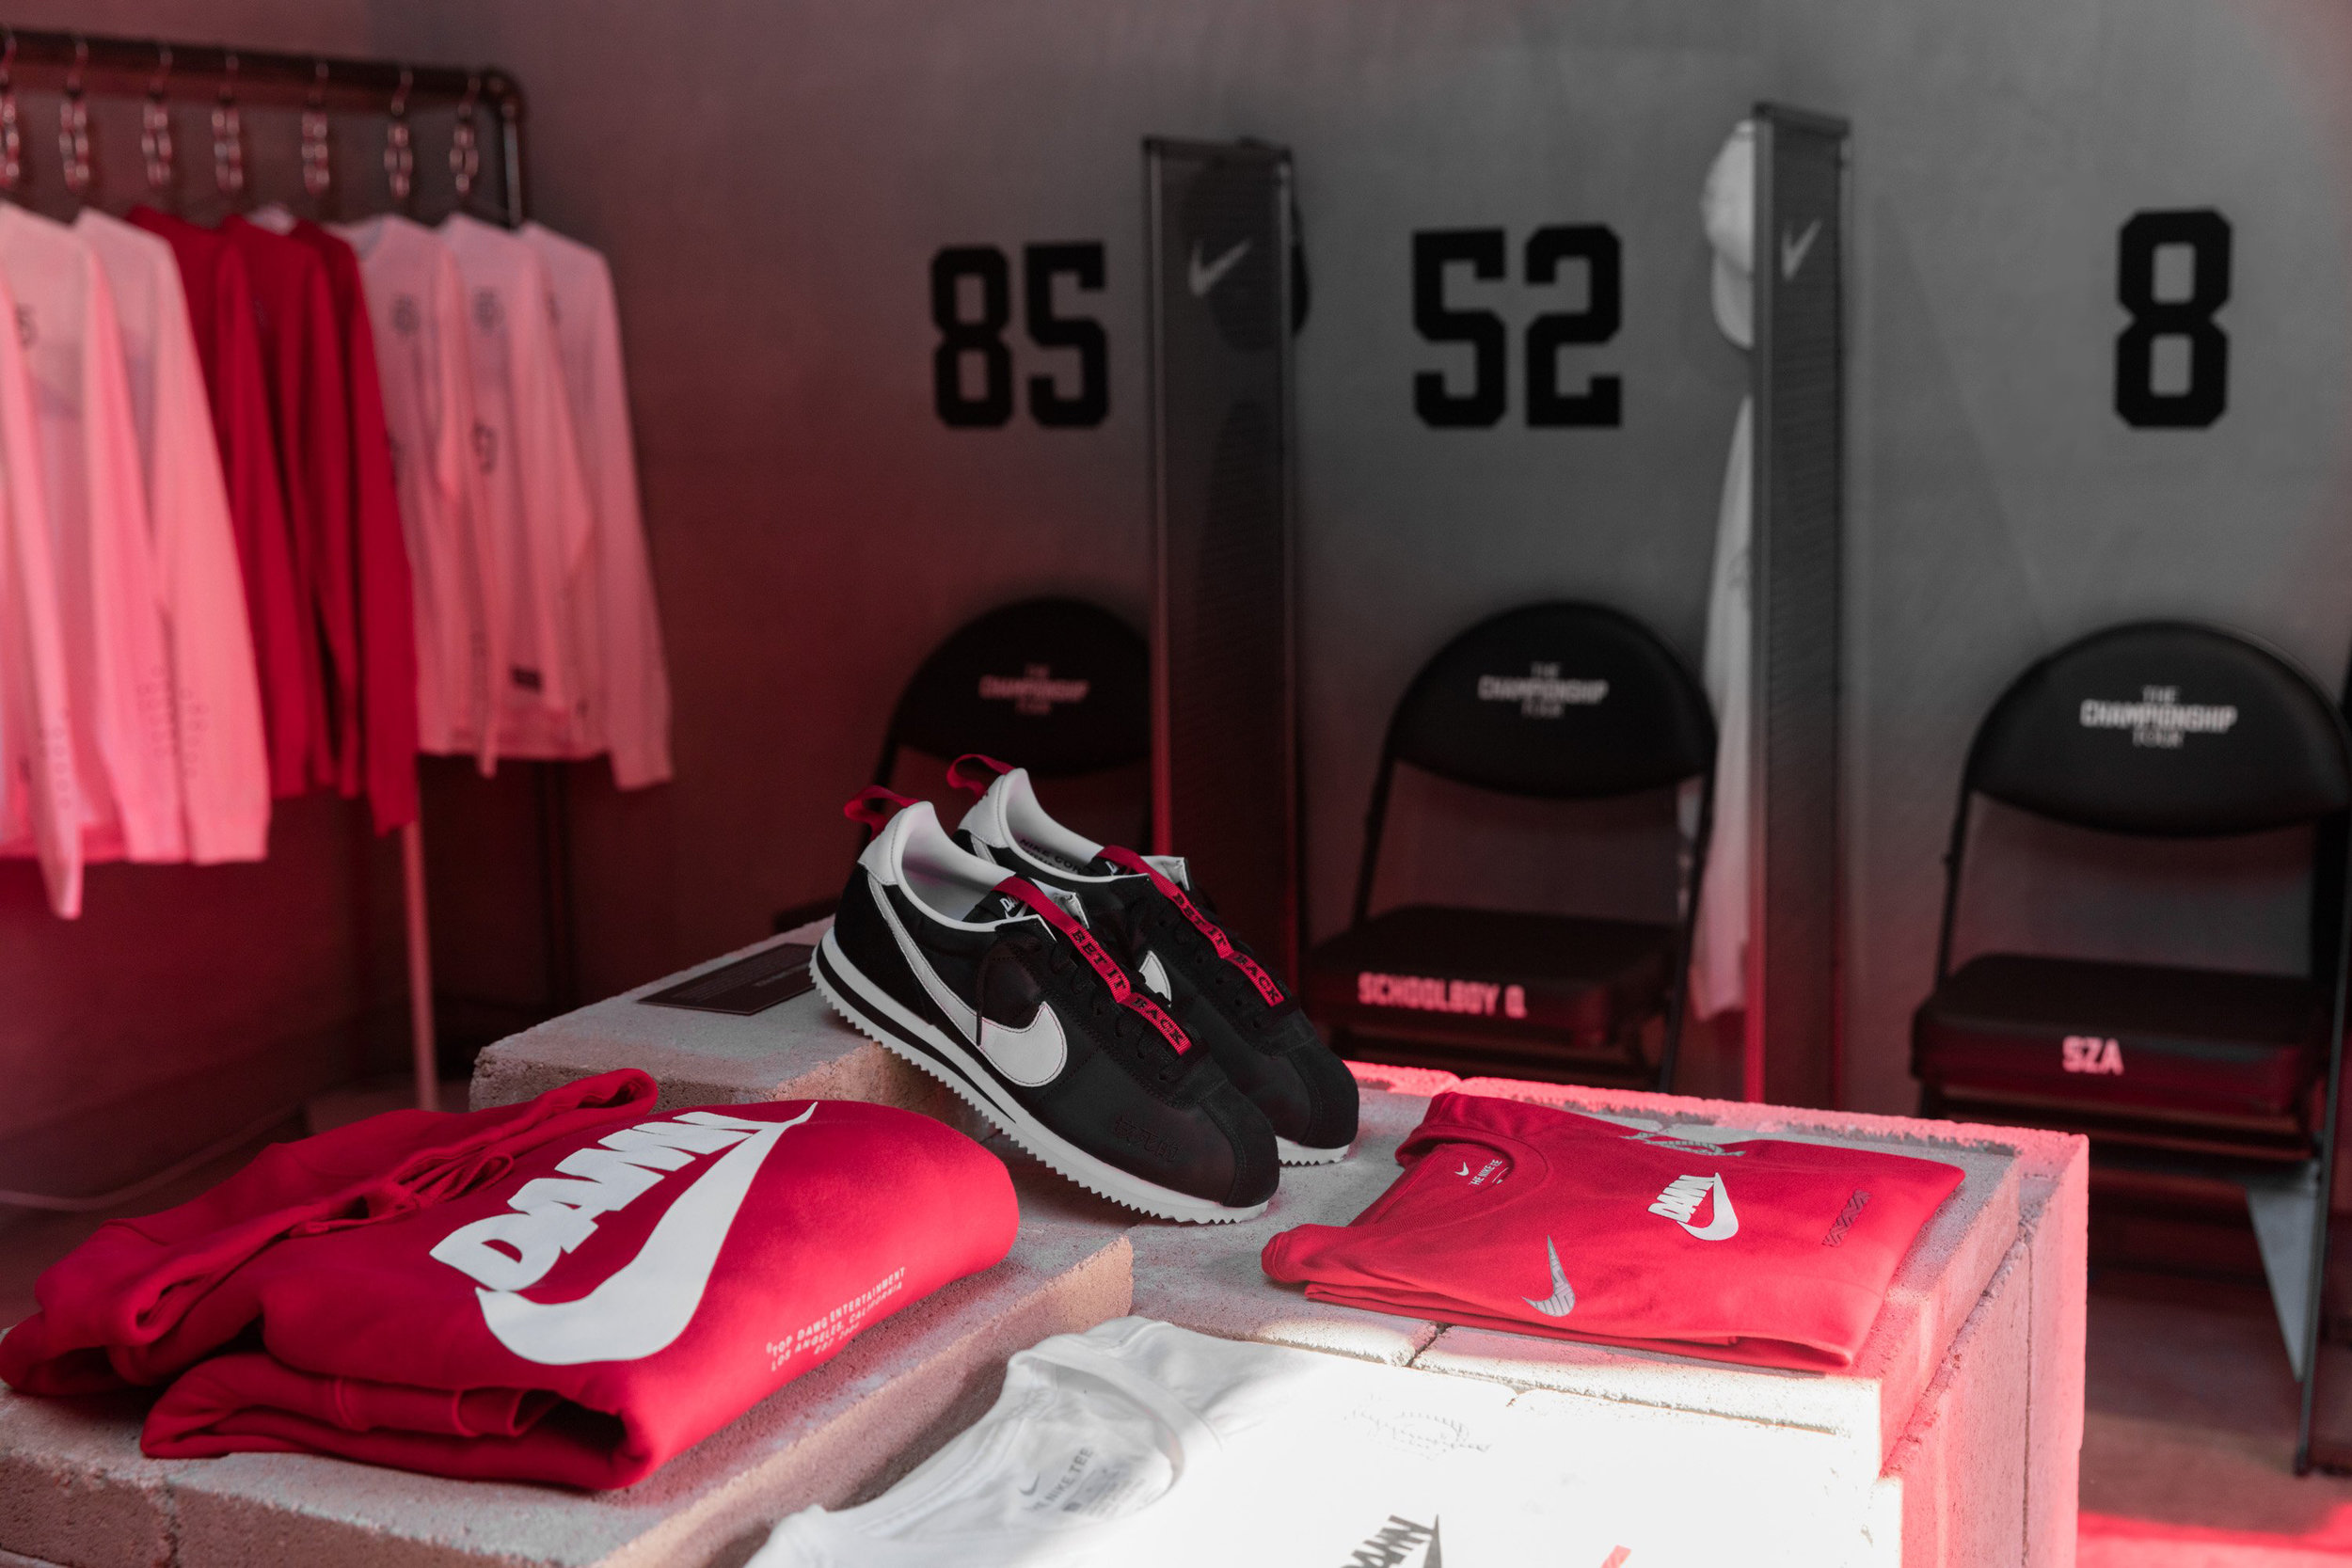 TDE_x_Nike_NYC_Concetpts_popup_13_of_27 copy.jpg